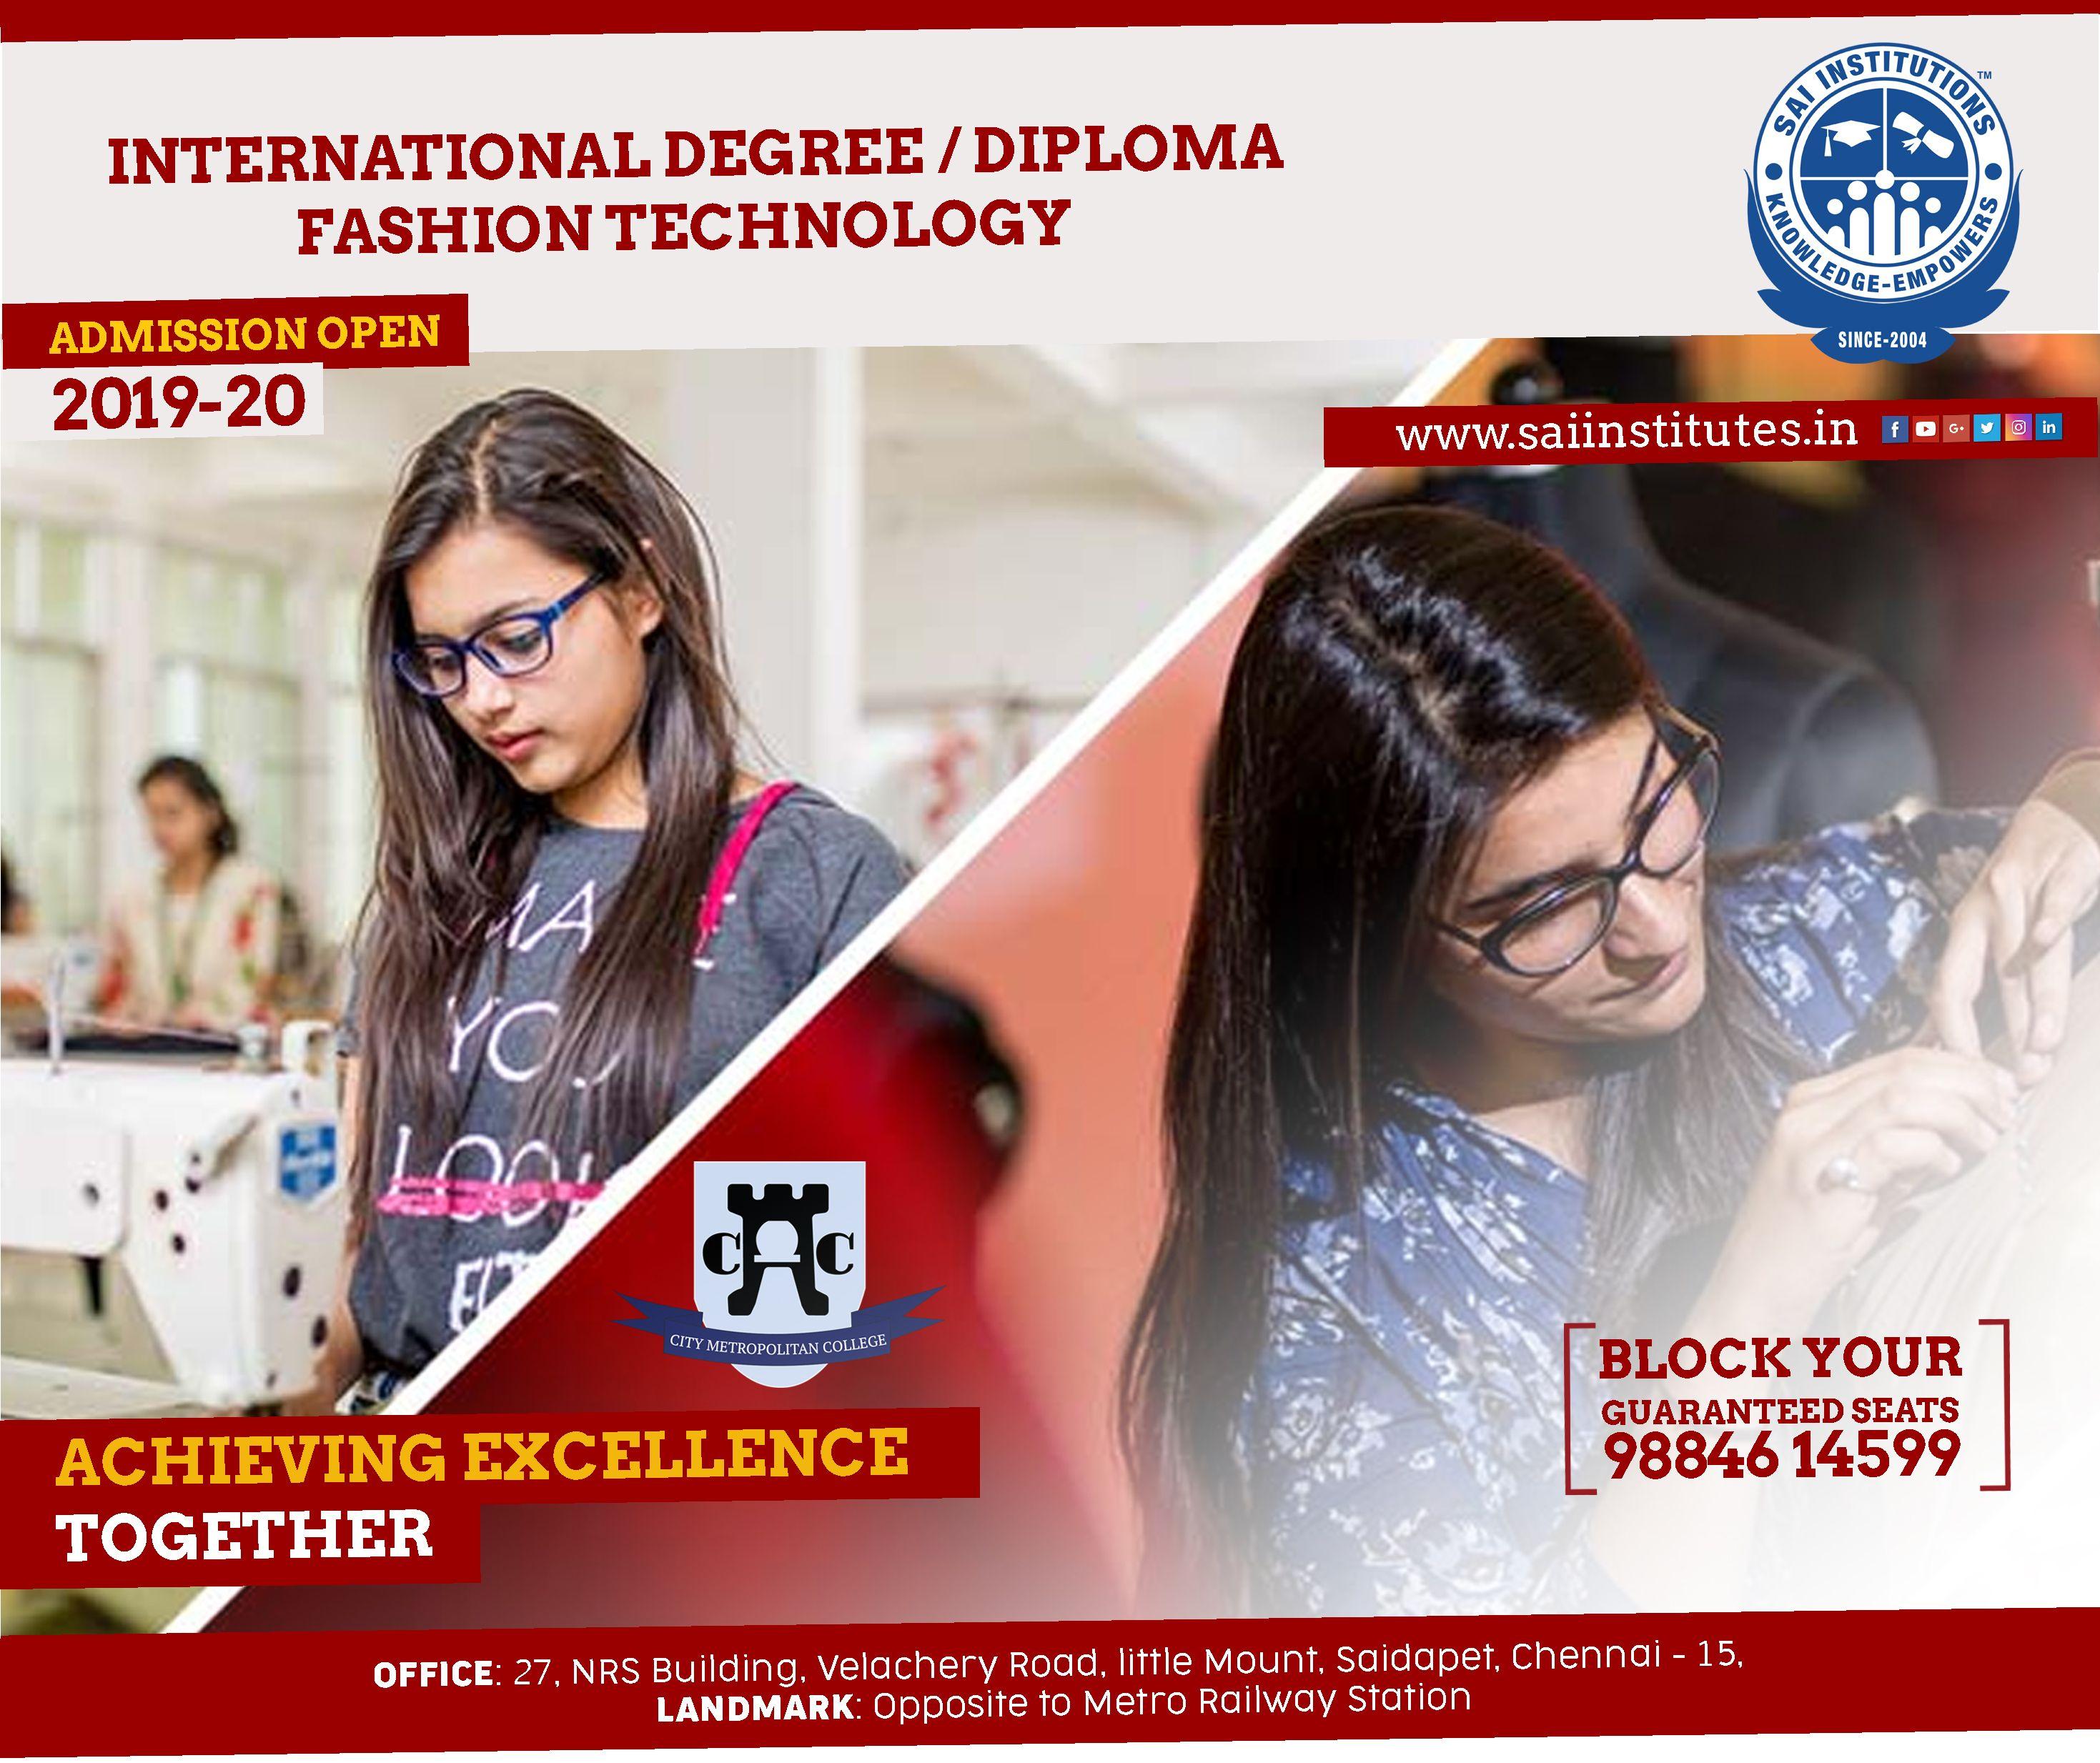 Fashion Design Course In Chennai Design Course Technology Fashion Fashion Design